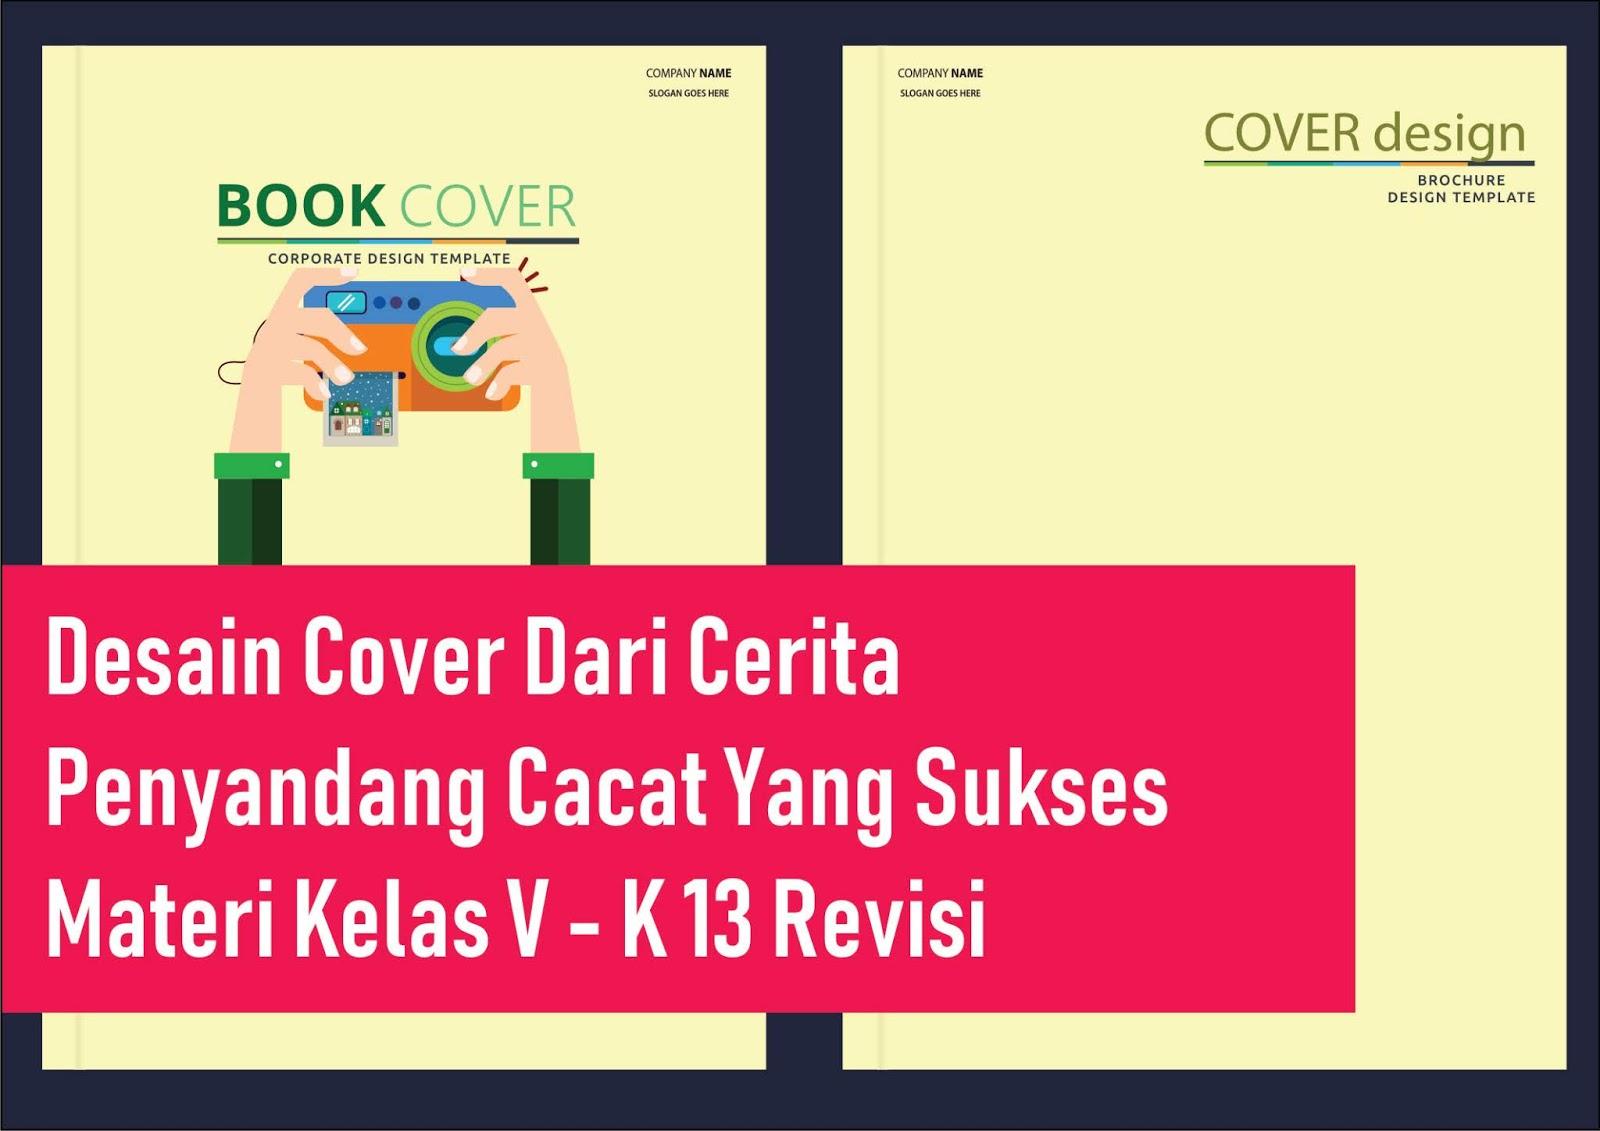 √Berkreasi Membuat Cover Buku Dari Cerita Penyandang Cacat